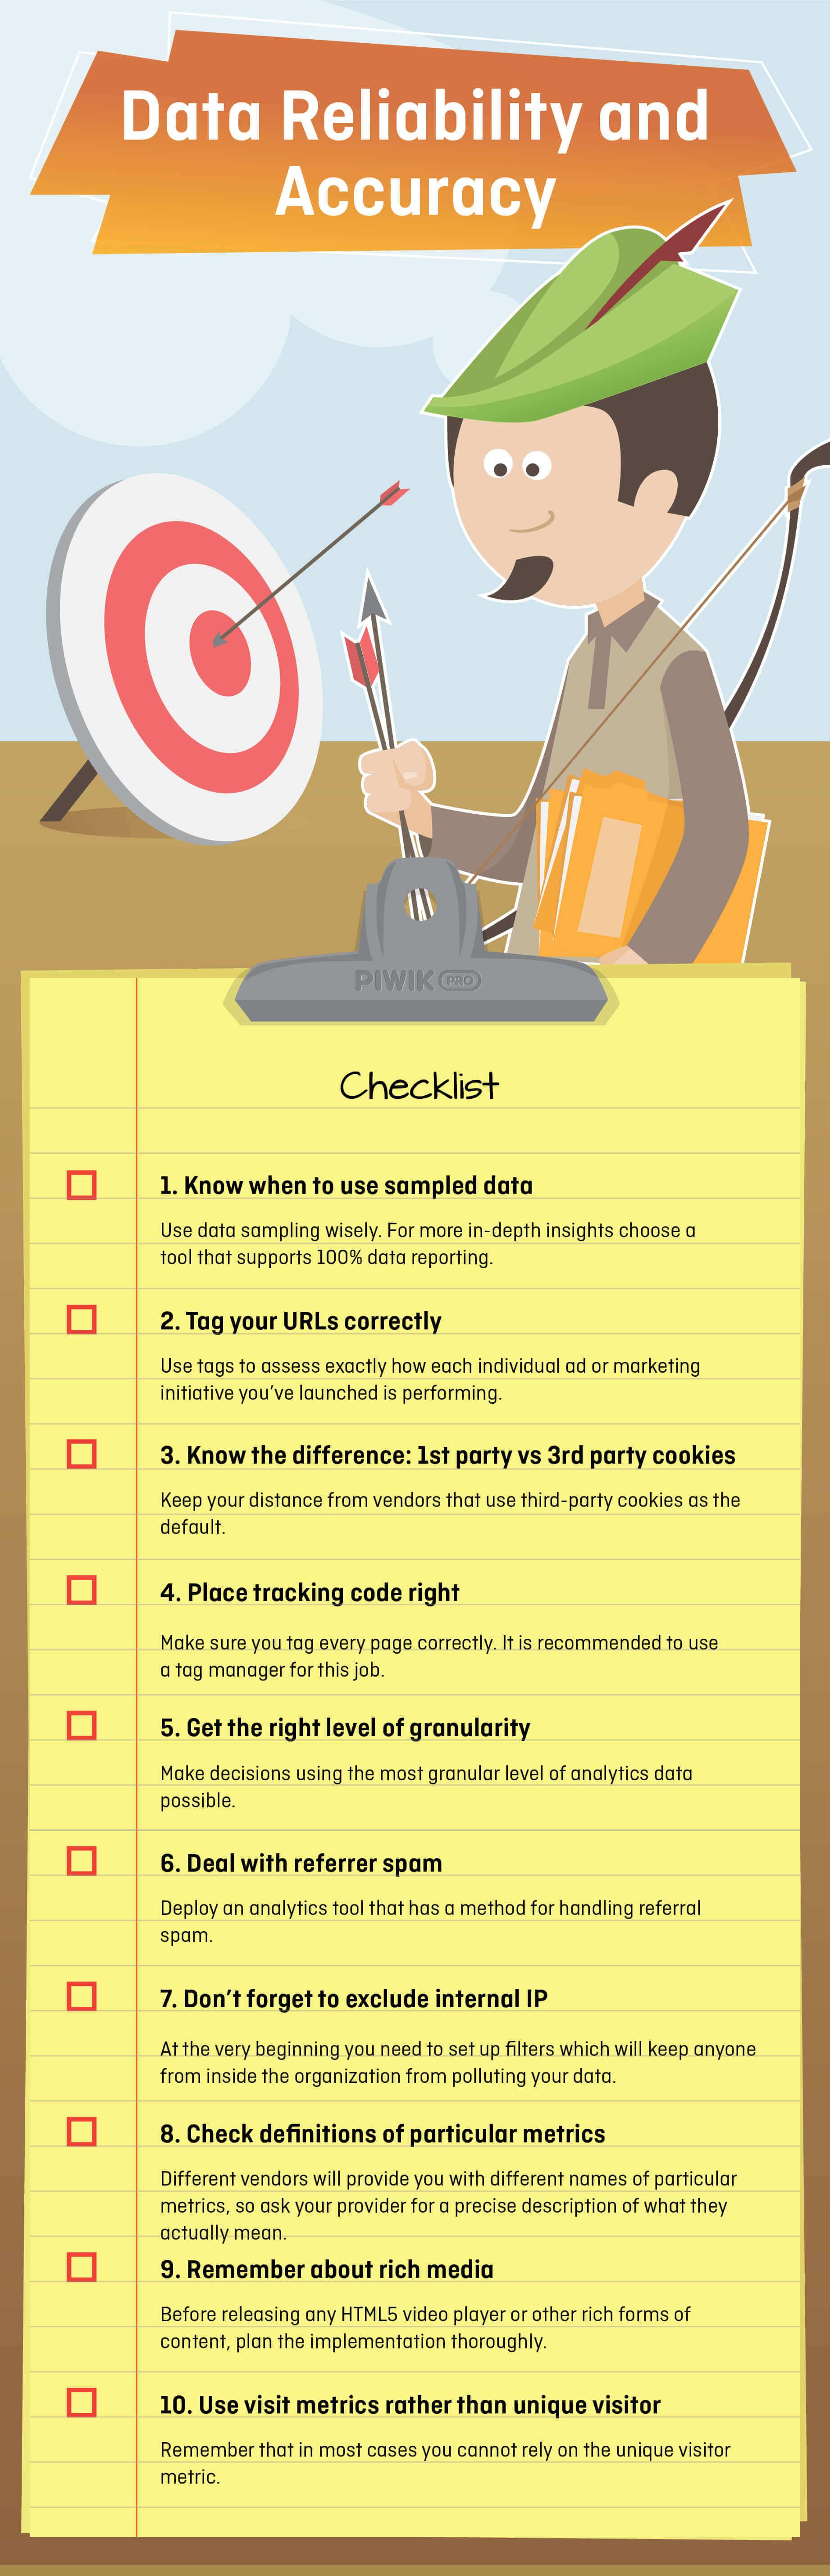 Data accuracy checklist